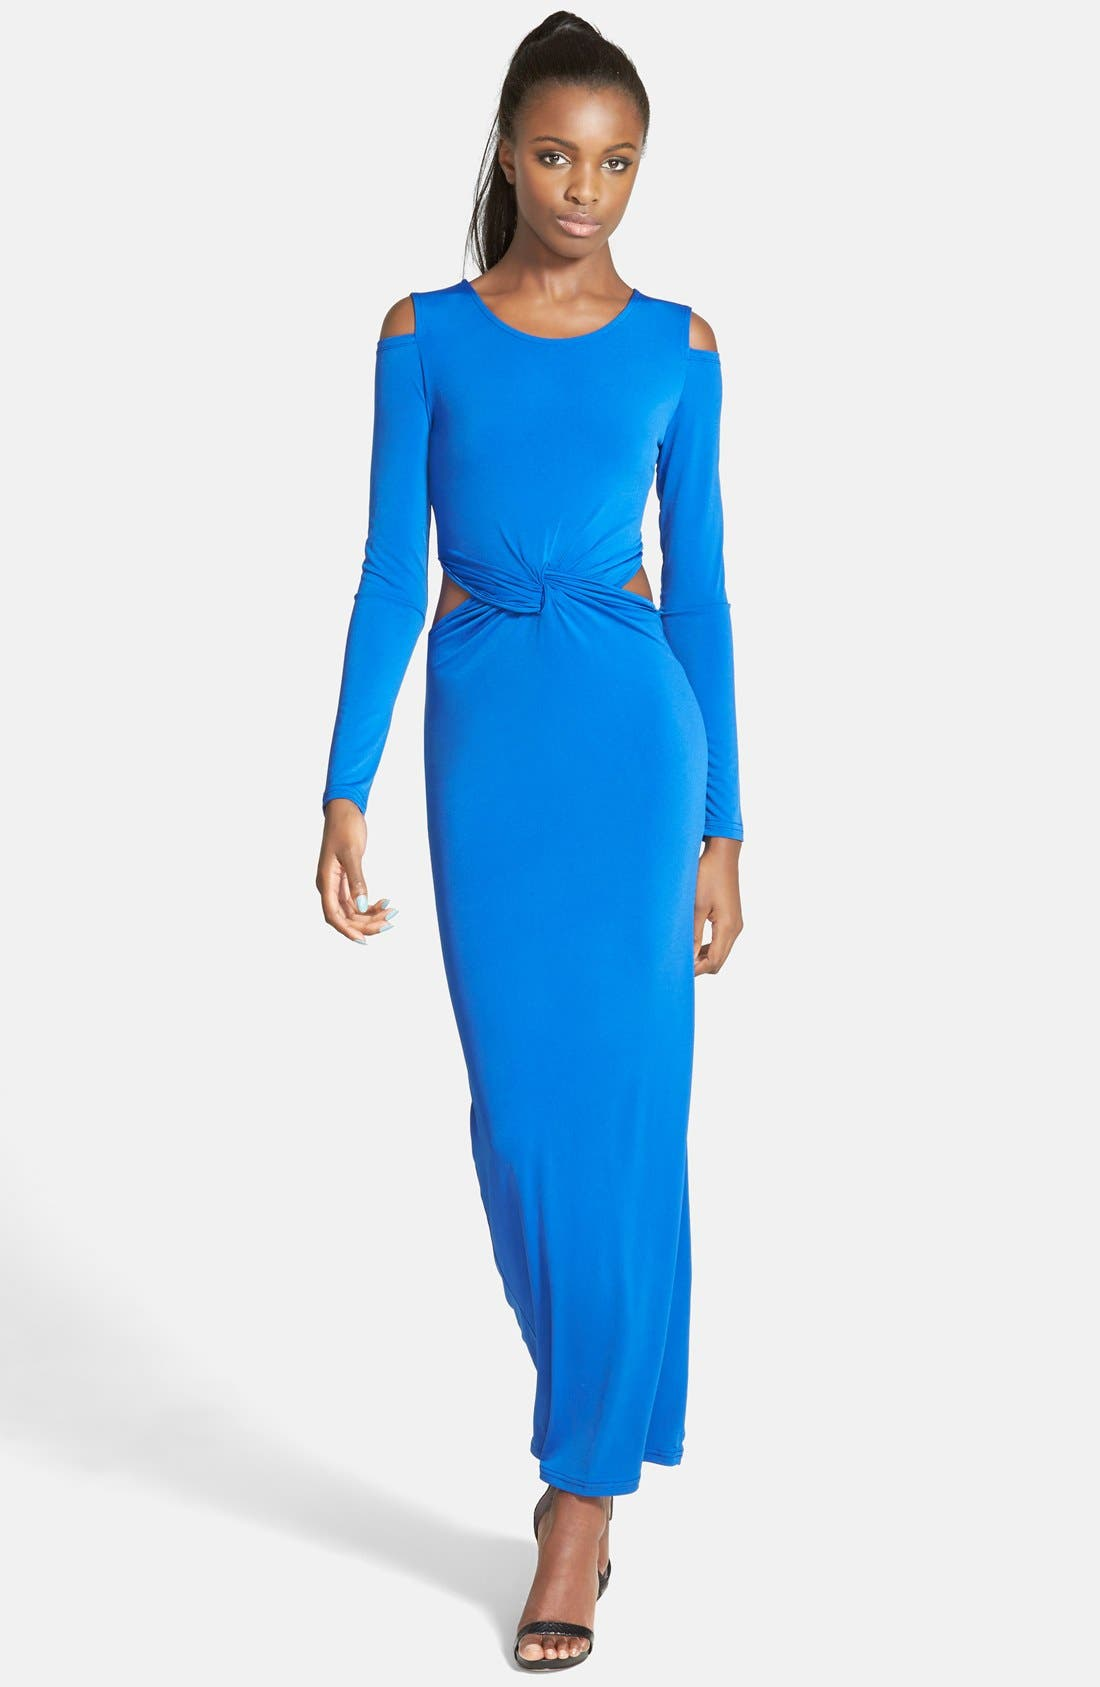 Alternate Image 1 Selected - Glamorous Twist Front Midi Dress